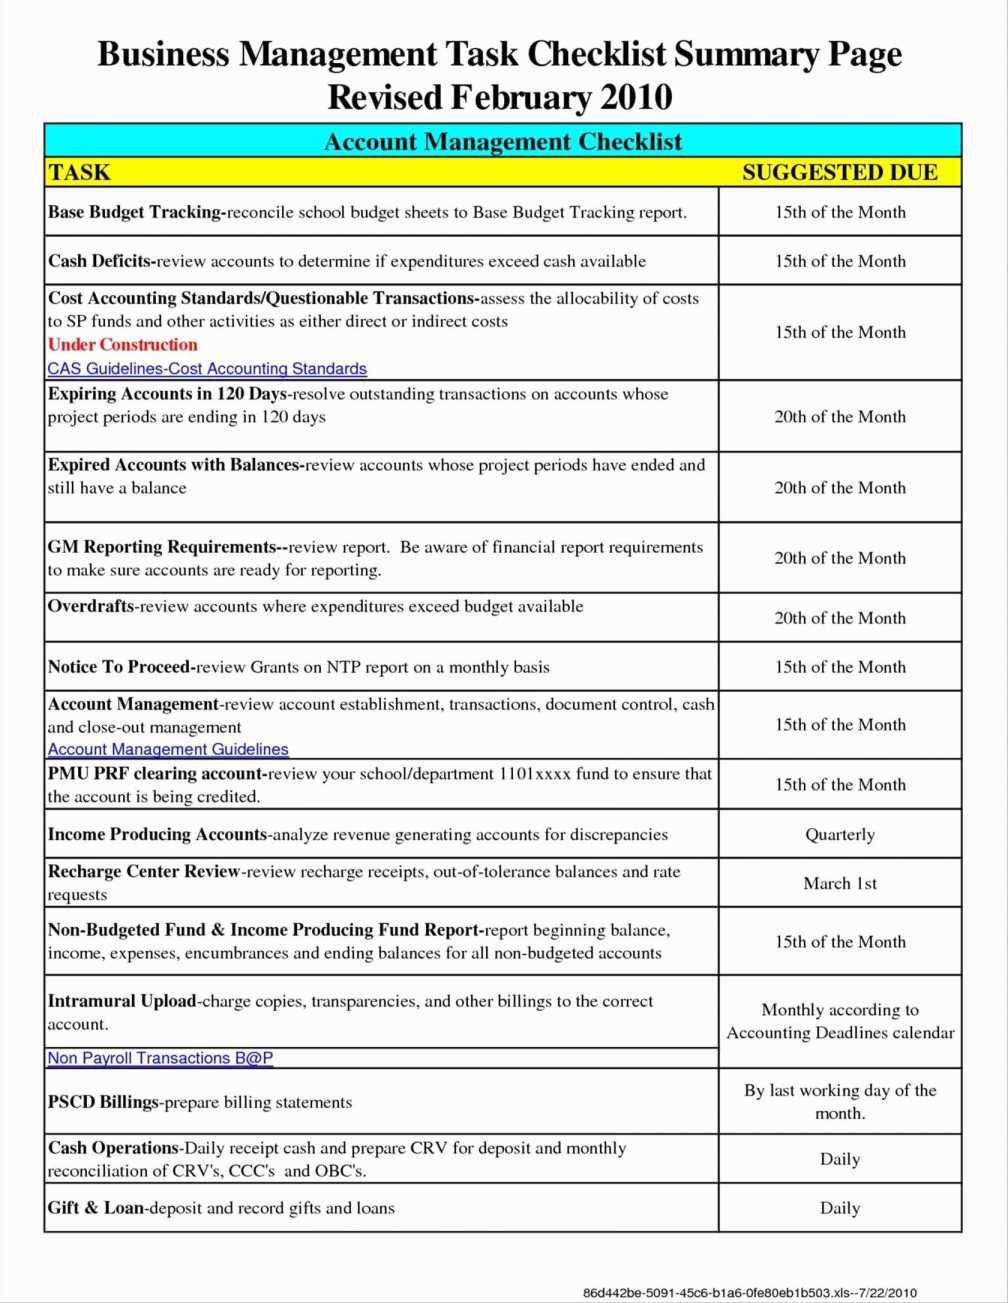 Gantt Diagramm Excel Vorlage Oder Ms Excel Gantt Chart Template Free Intended For Gantt Chart Template Microsoft Office